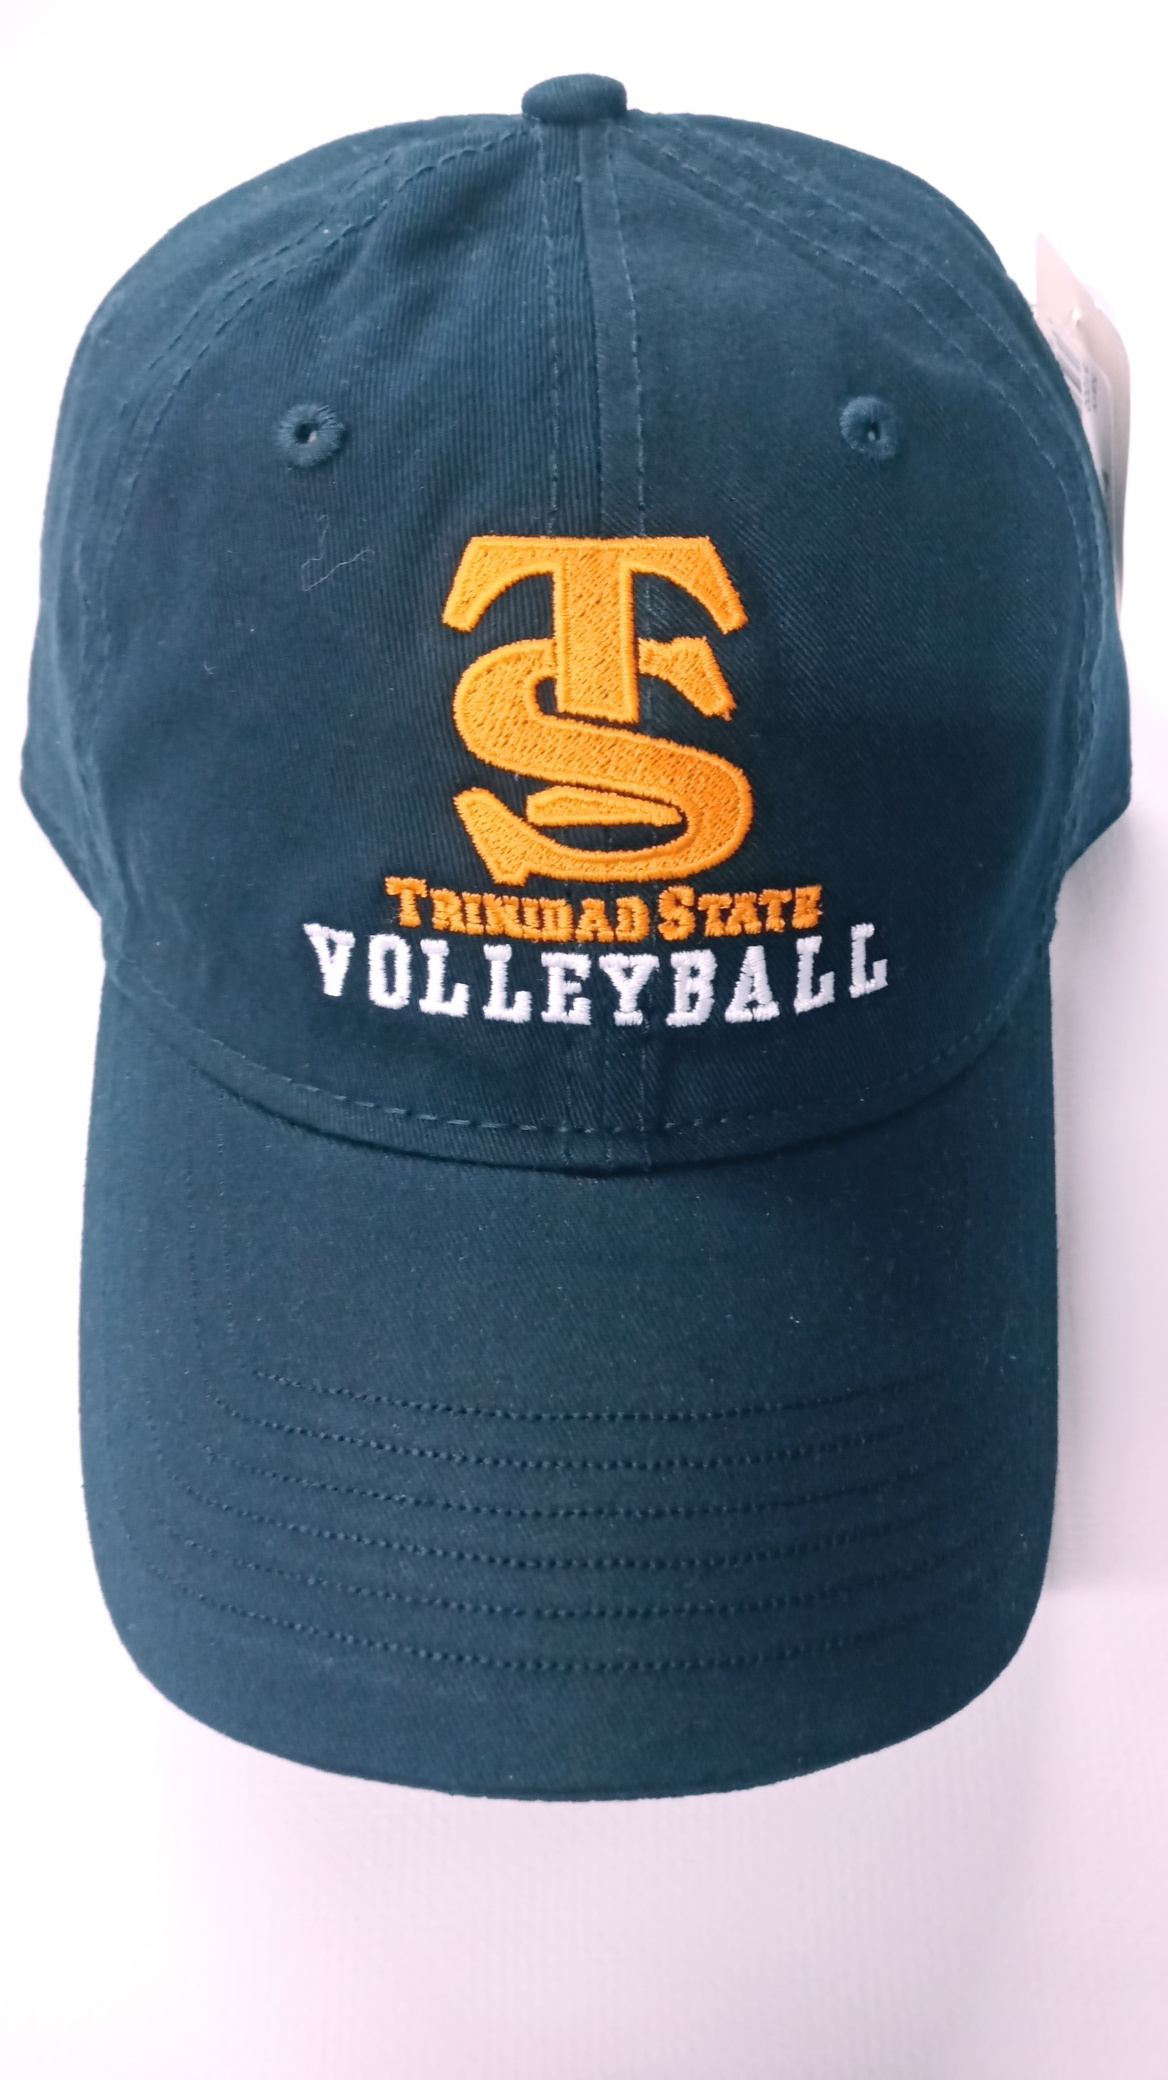 TSJC Baseball Cap (Volleyball)